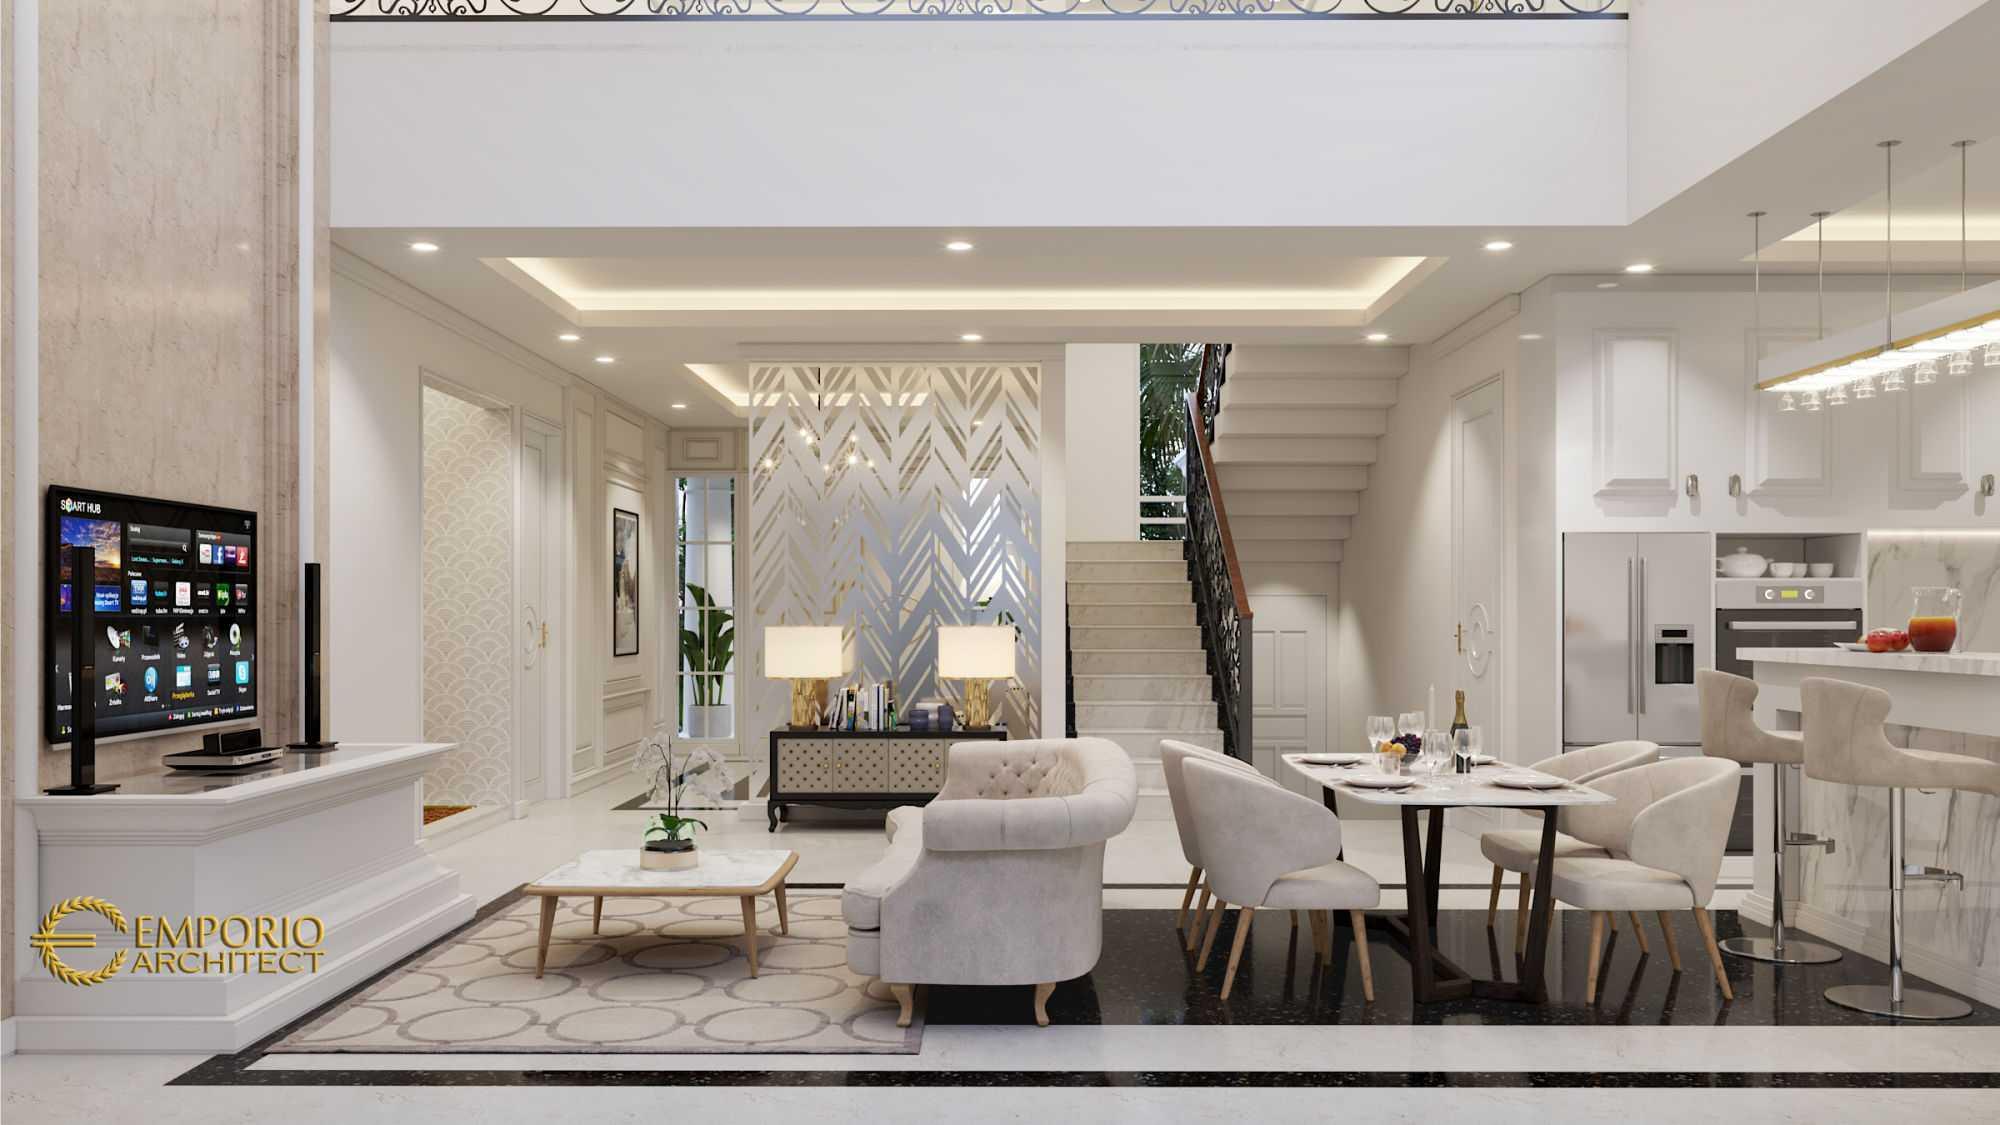 Emporio Architect Jasa Arsitek Pekanbaru Desain Rumah Classic Tropis 663 @ Pekanbaru, Riau Pekanbaru, Kota Pekanbaru, Riau, Indonesia Pekanbaru, Kota Pekanbaru, Riau, Indonesia Emporio-Architect-Jasa-Arsitek-Pekanbaru-Desain-Rumah-Classic-Tropis-663-Pekanbaru-Riau   80709